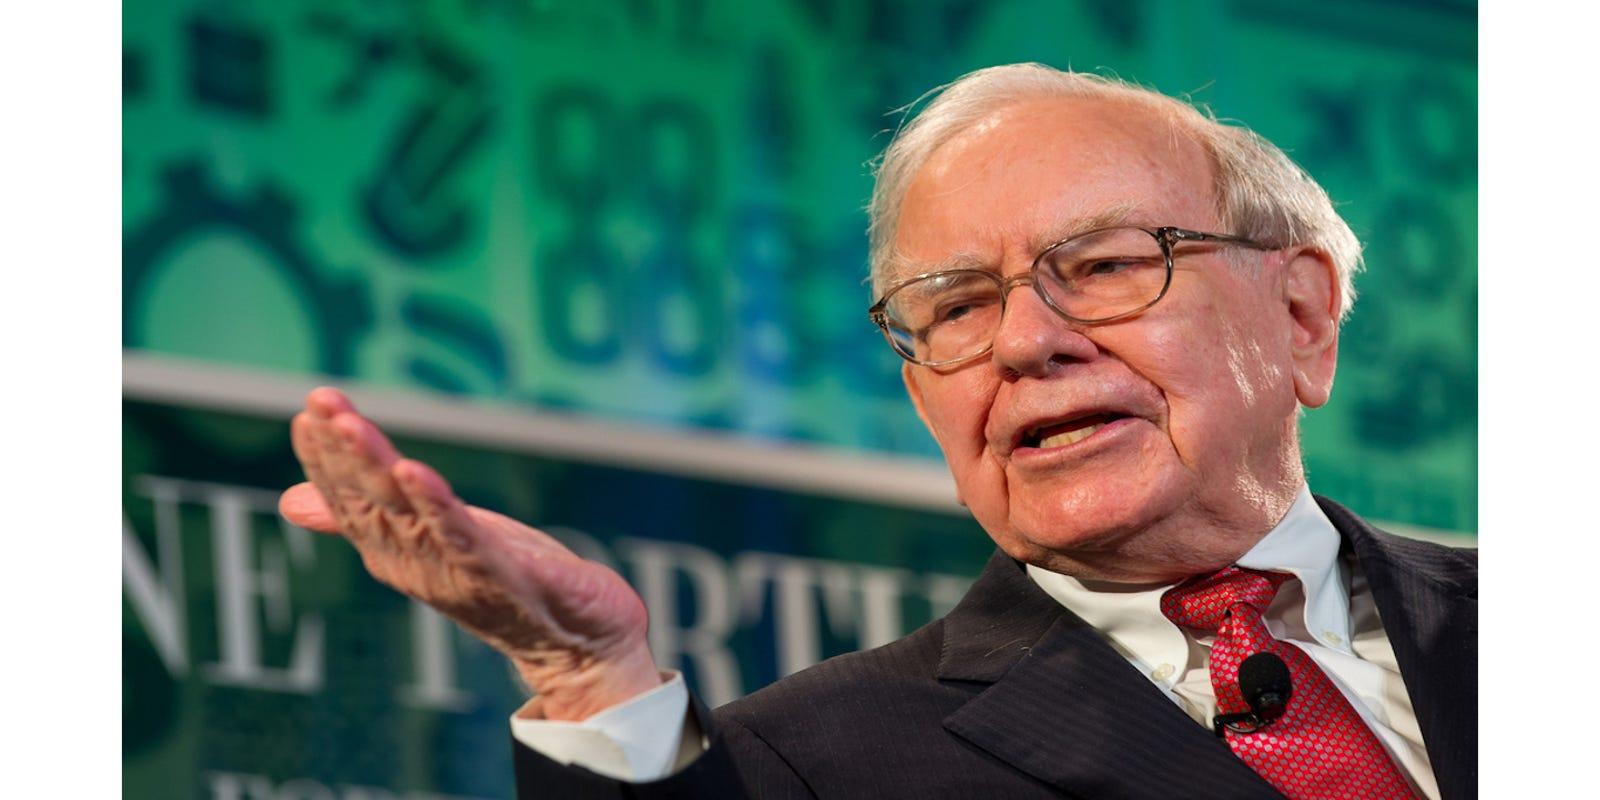 Take a peek at Warren Buffett portfolio and his 11 longest-held stocks